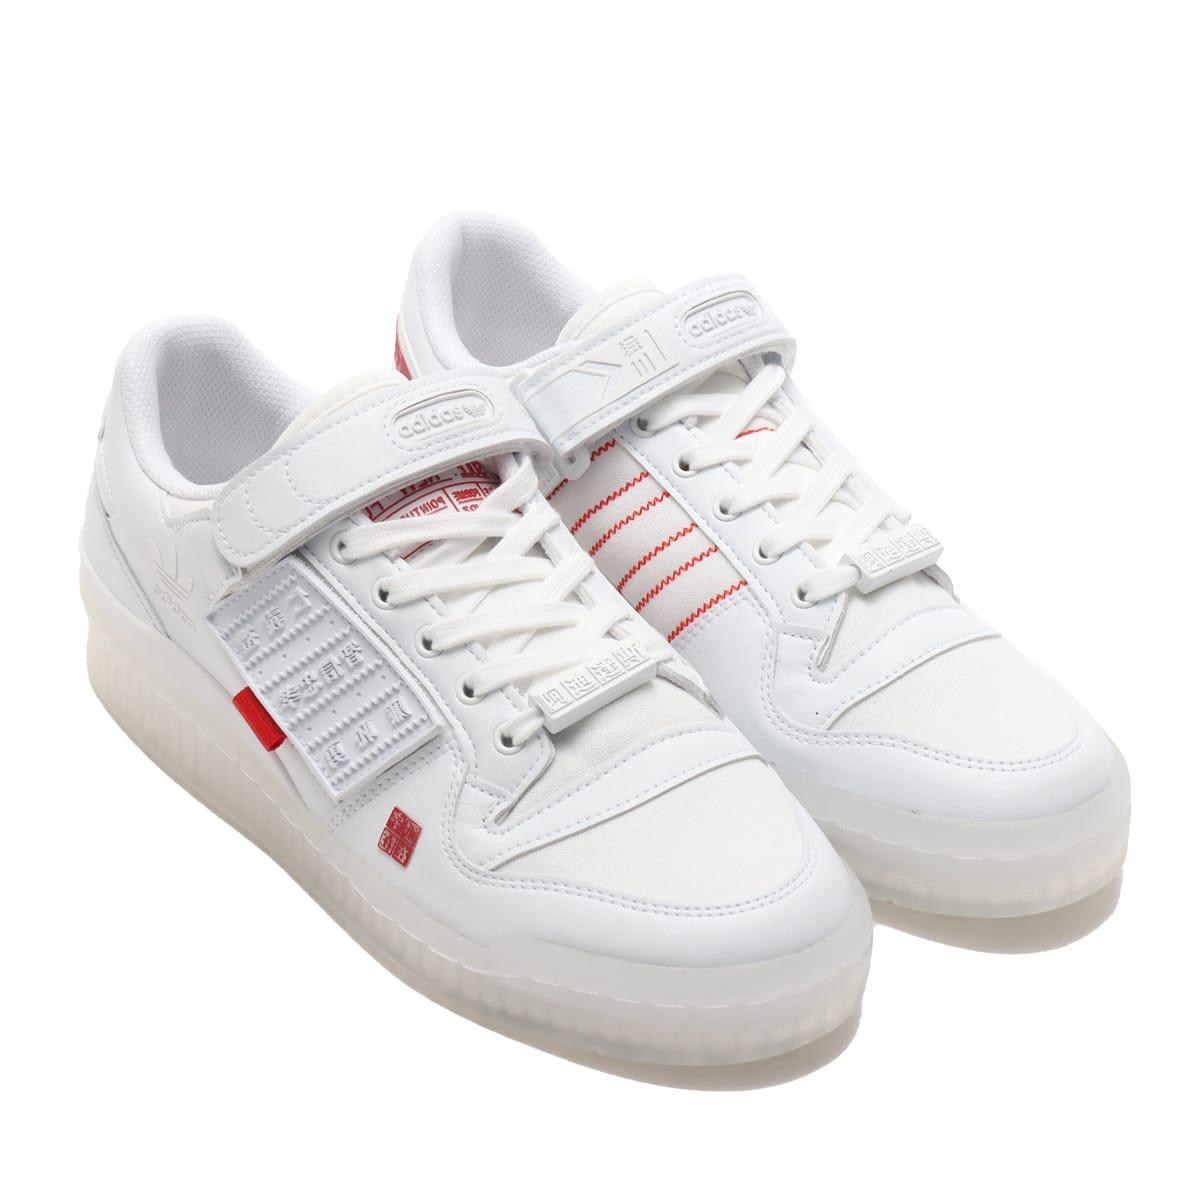 adidas FORUM LOW FOOTWEAR WHITE/FOOTWEAR WHITE/CRYSTAL WHITE 21SS-S_photo_large